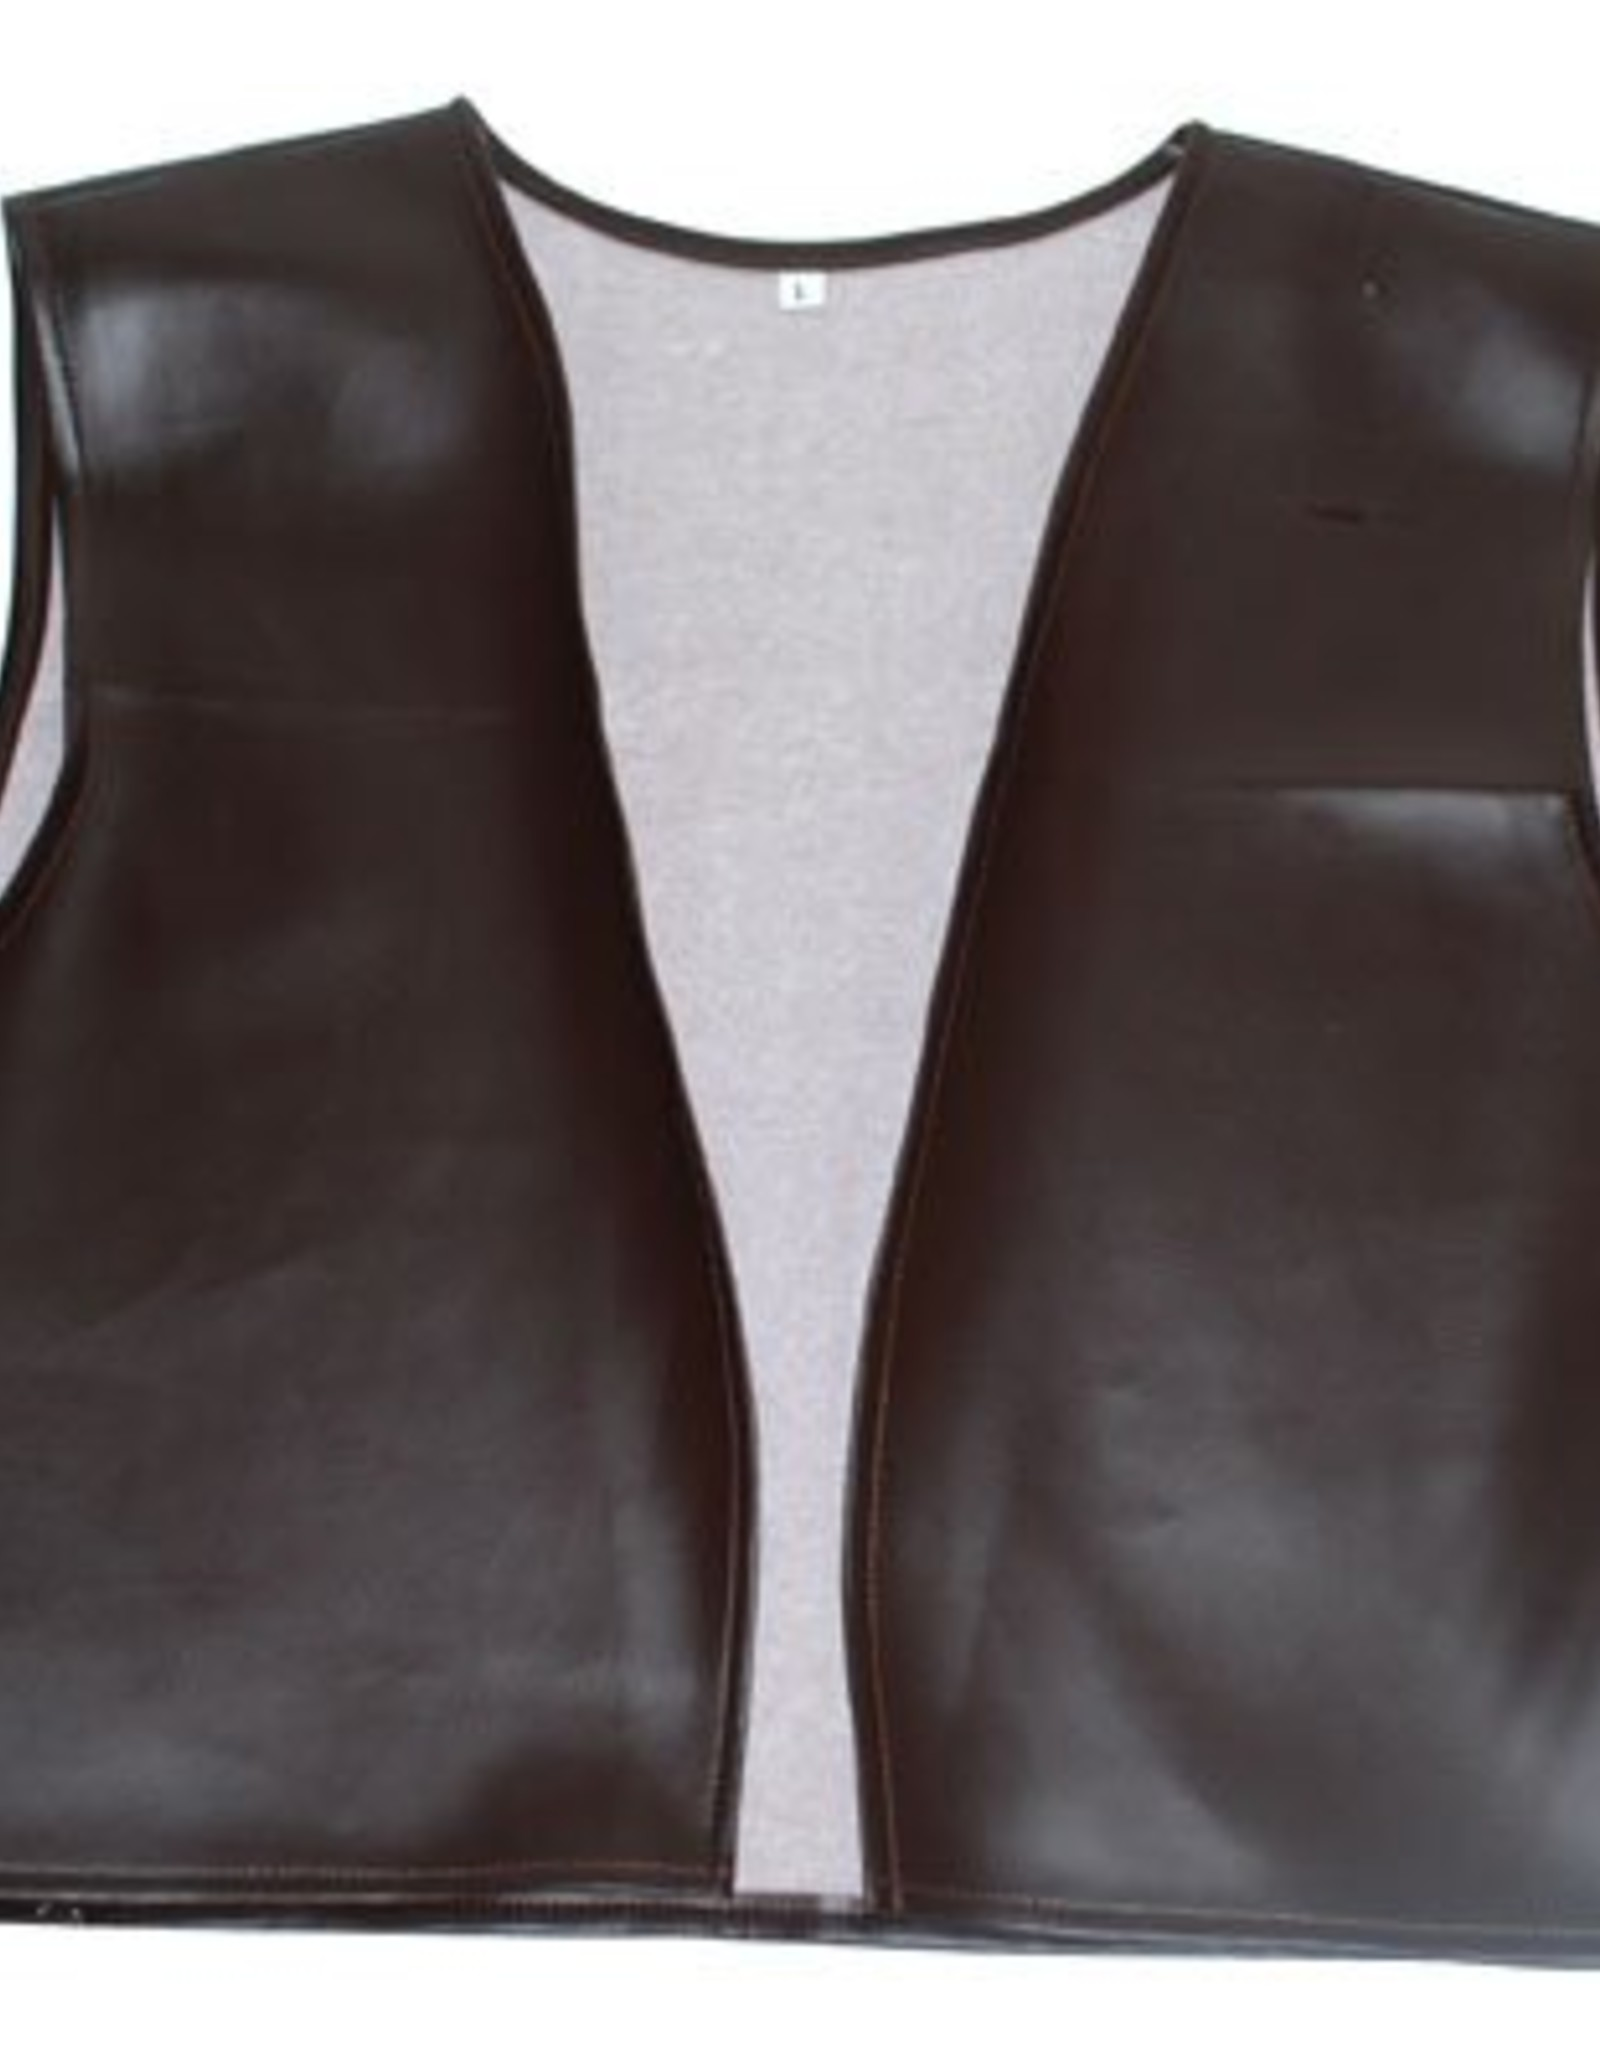 ESPA Vest